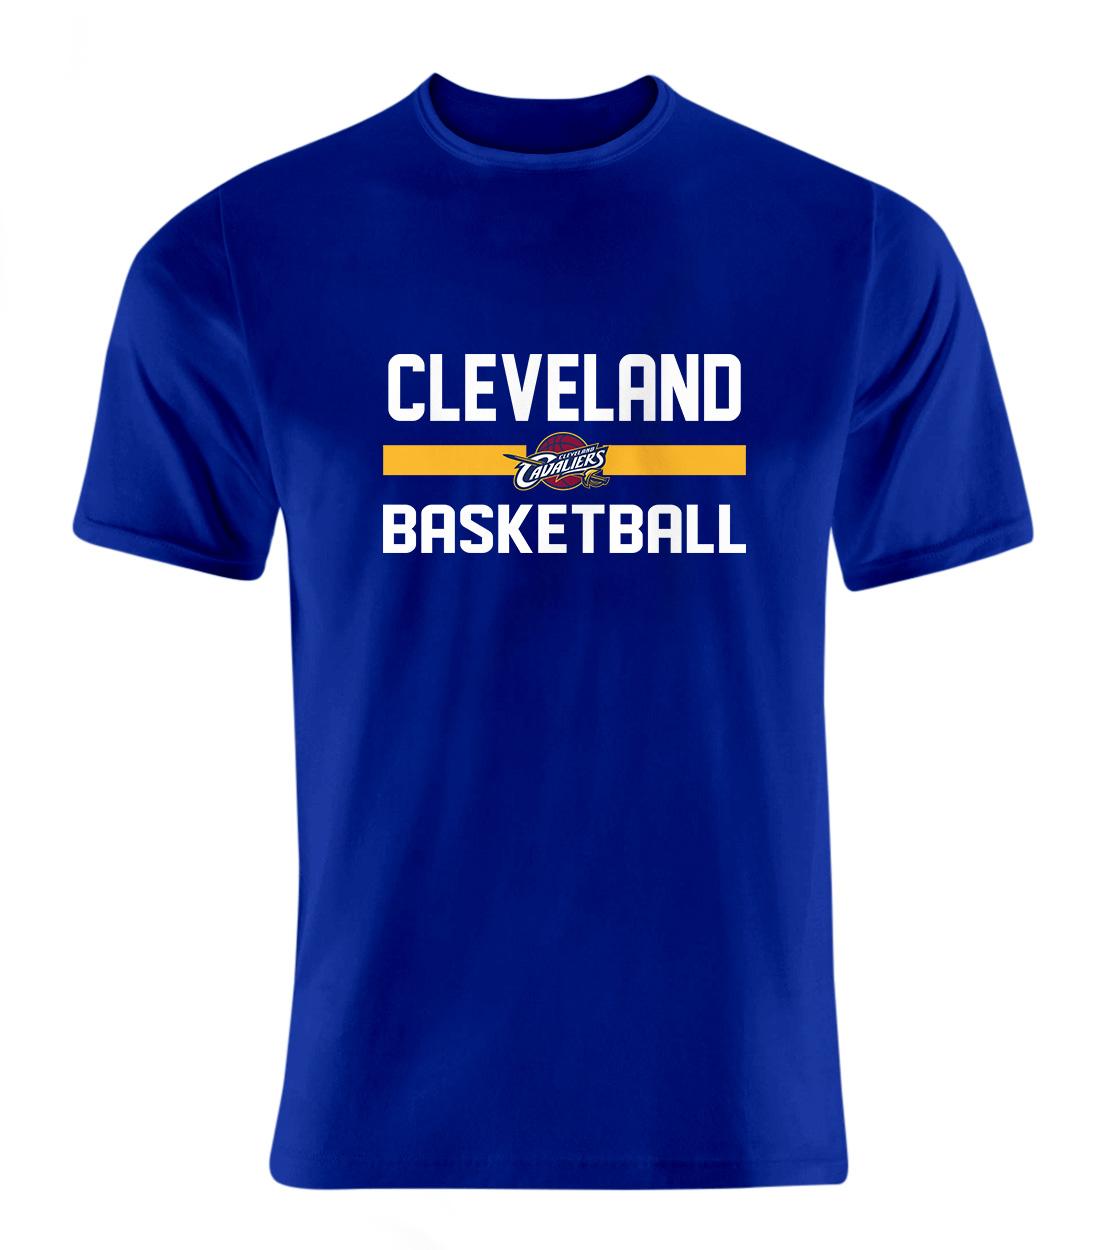 Cleveland Basketball Tshirt (TSH-BLU-NP-66-NBA-CLE-BASKETBALL)